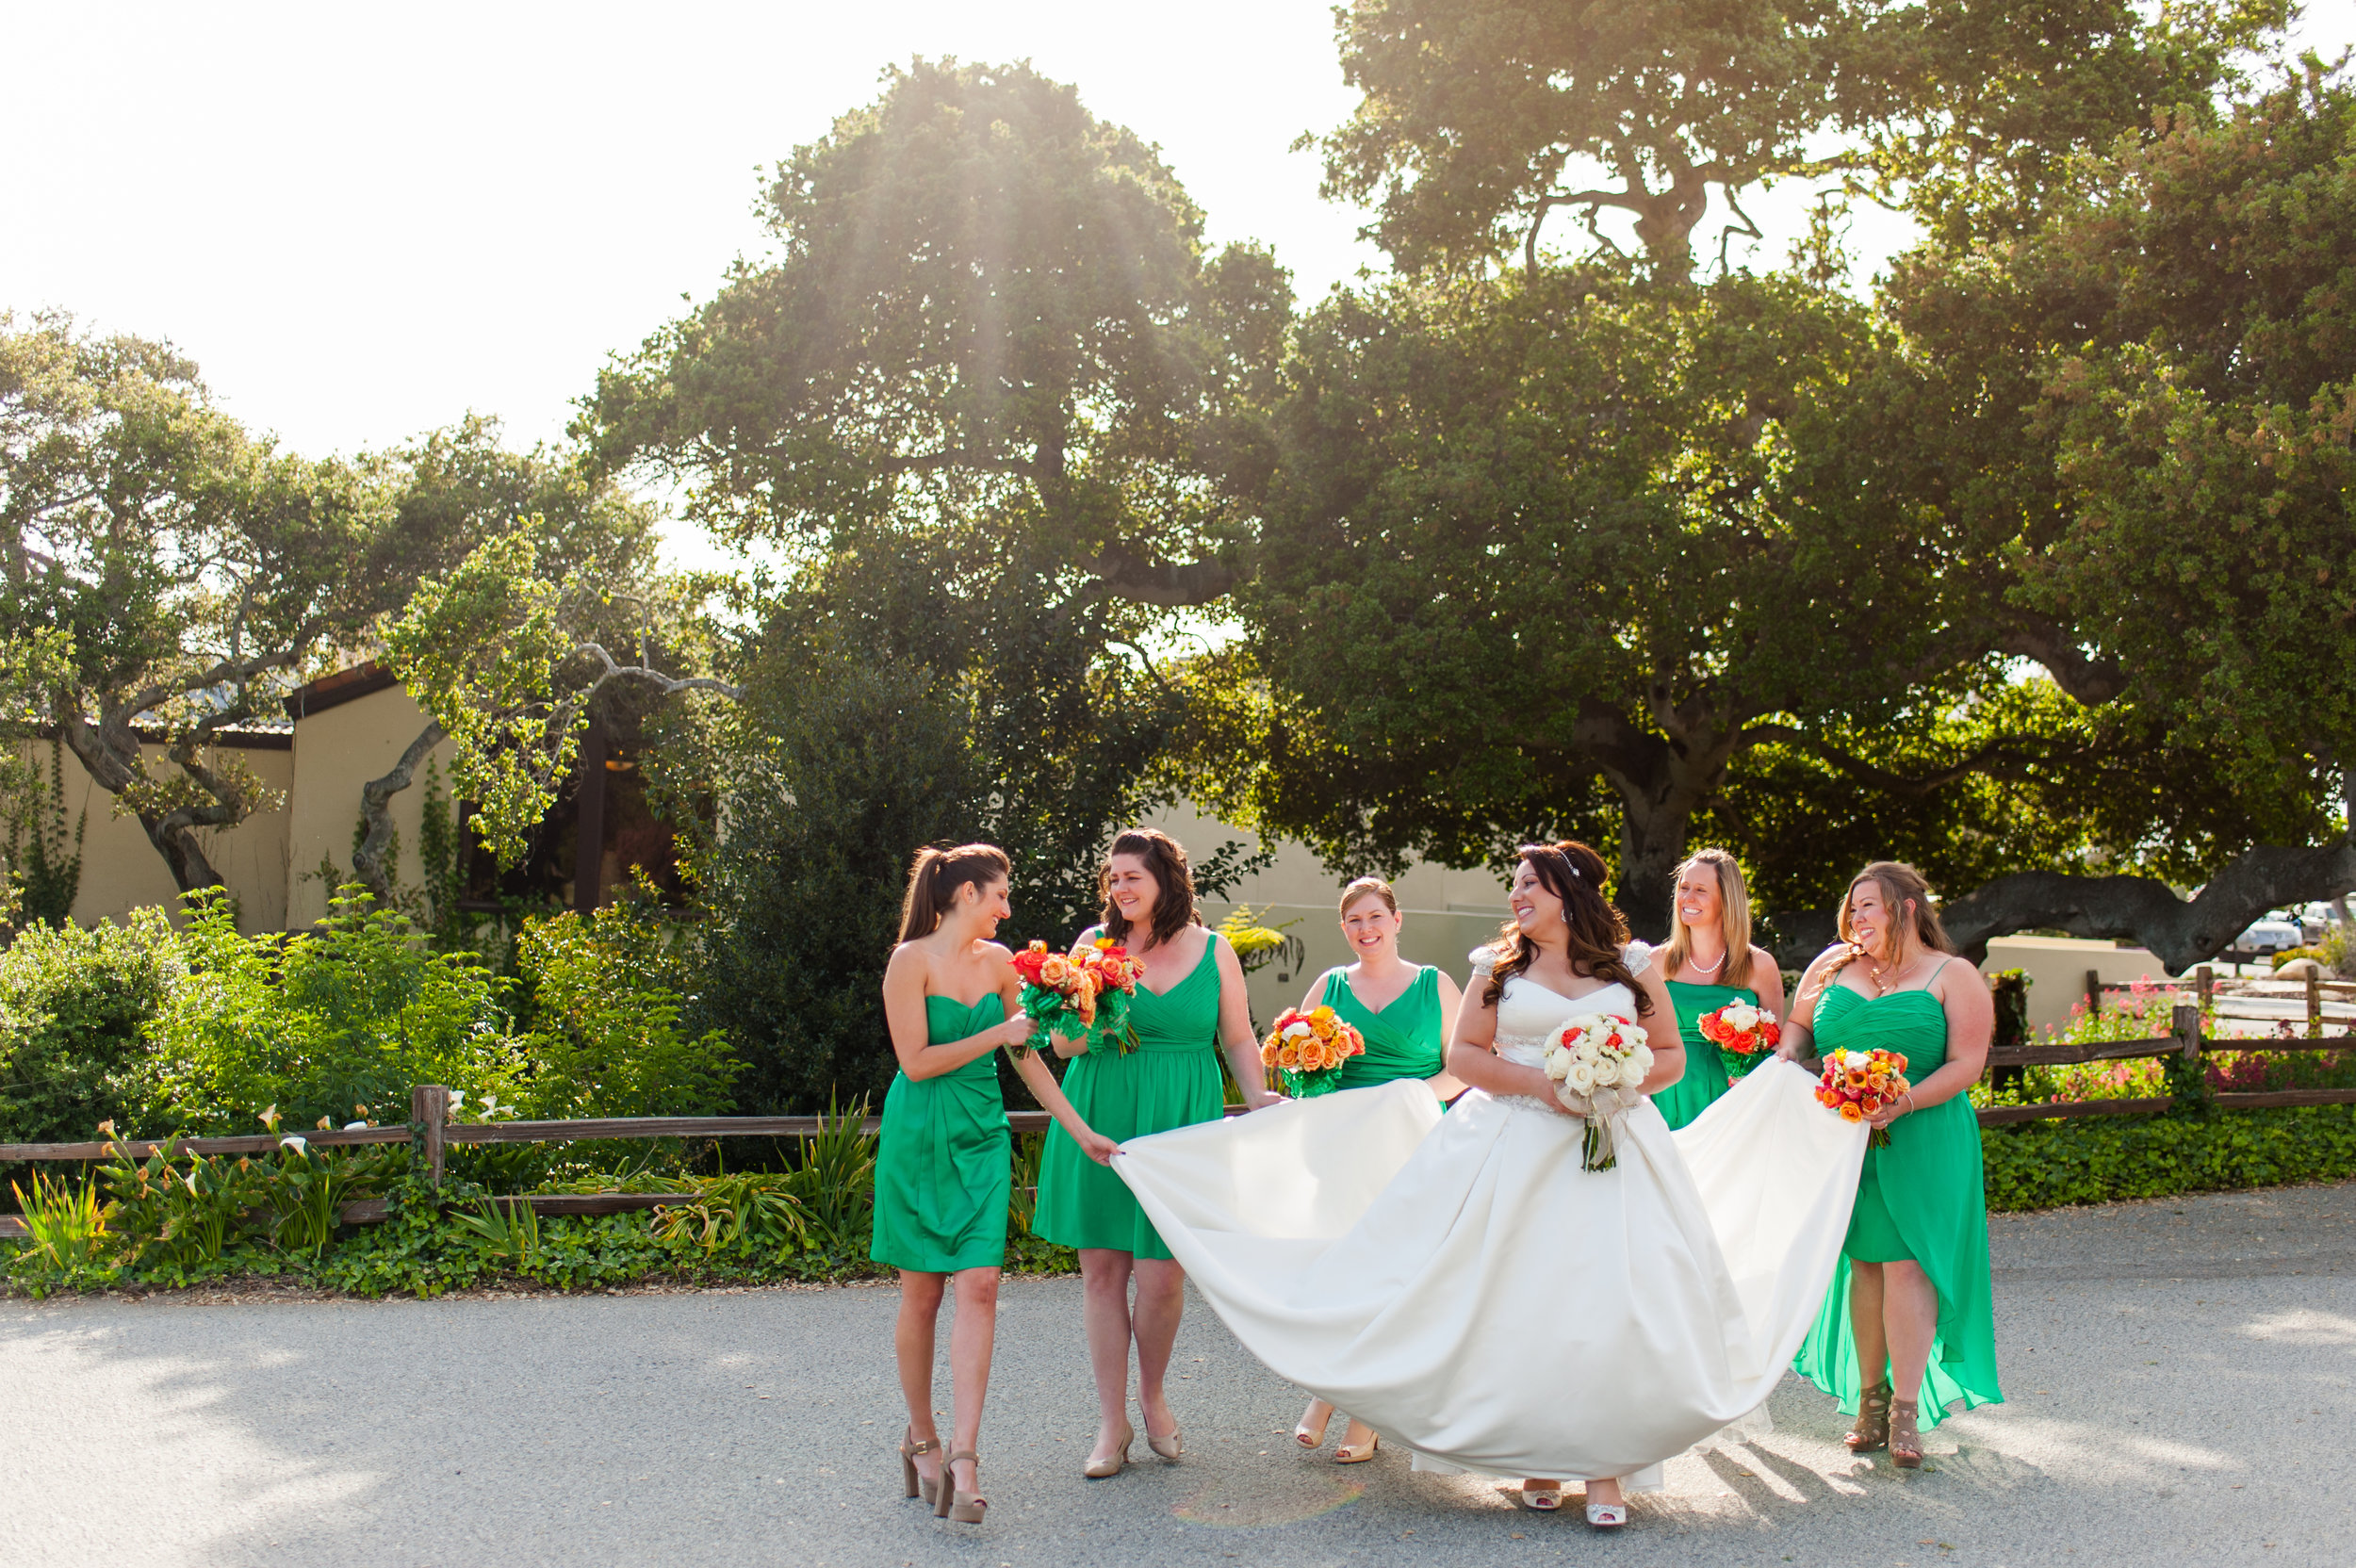 lauren-joel-001-rancho-canada-golf-course-carmel-wedding-photographer-katherine-nicole-photography007.JPG